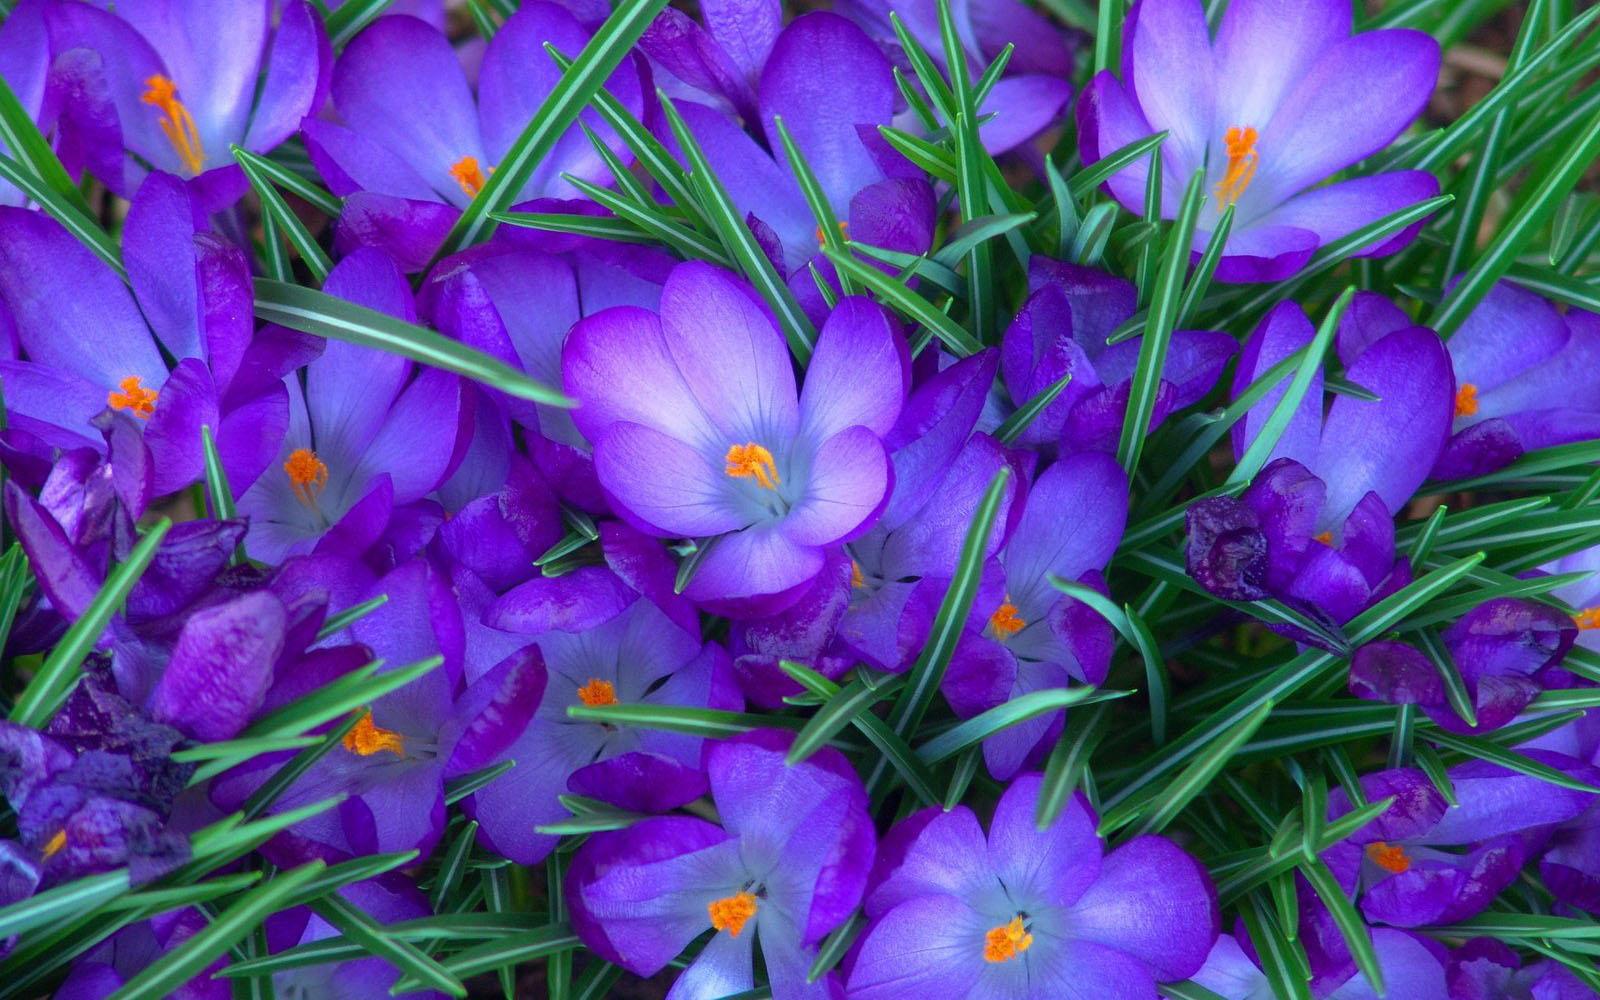 Flowers Wallpapers Purple Crocus Flowers Desktop Wallpapers Purple 1600x1000